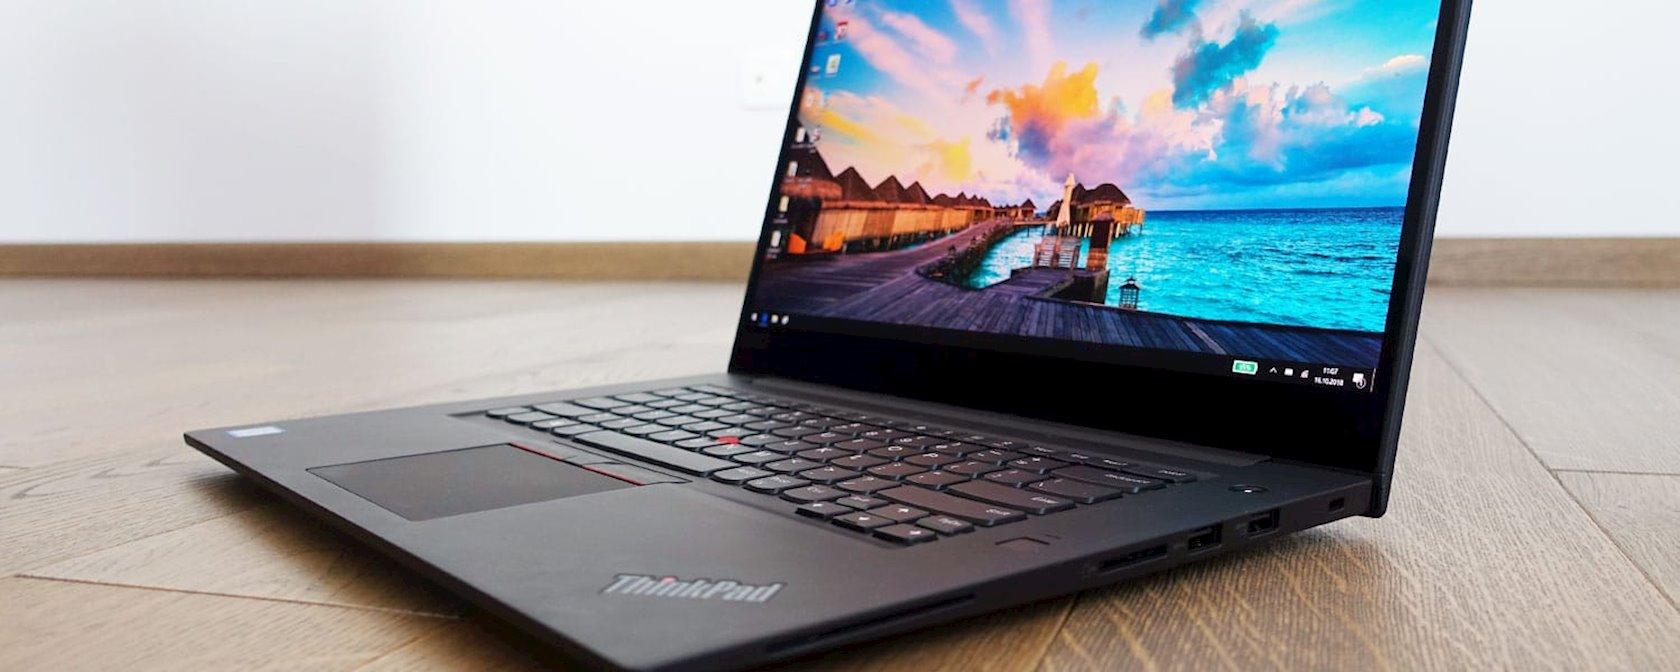 Noutbuk Lenovo ThinkPad X1 Extreme 1st Gen, NVIDIA, 256 Gb